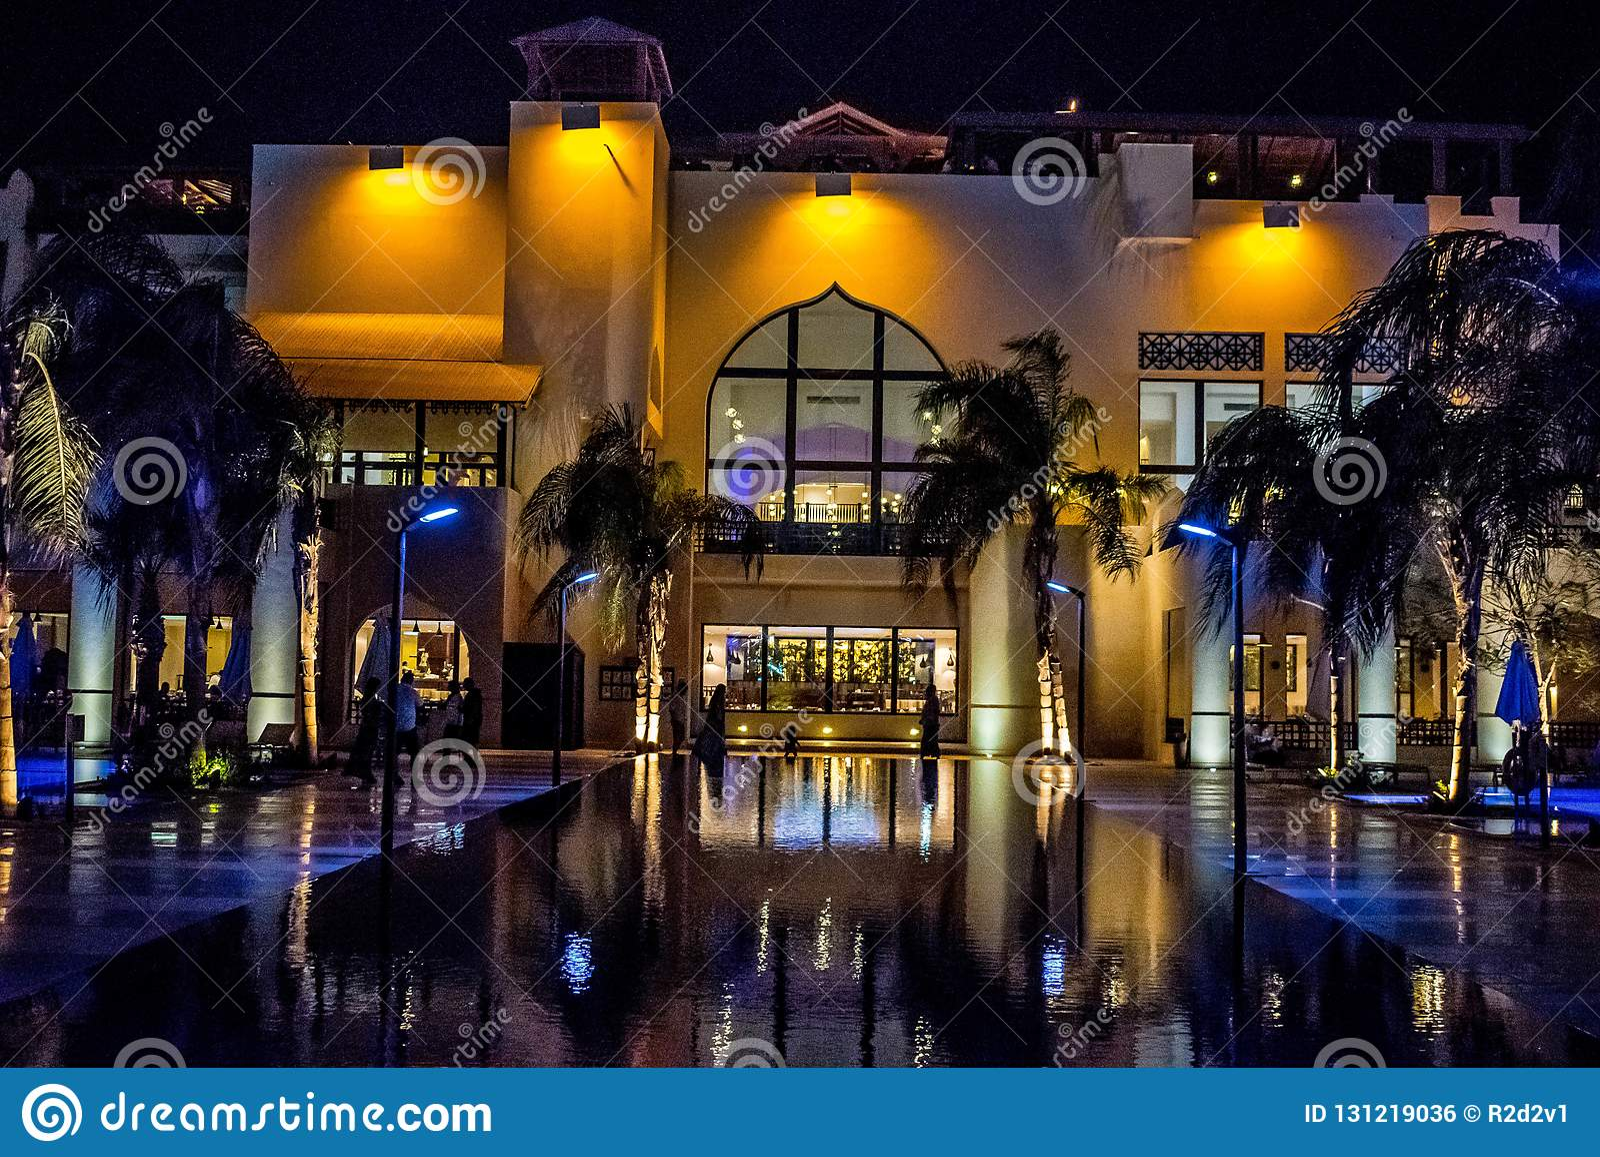 Five star hotel at night